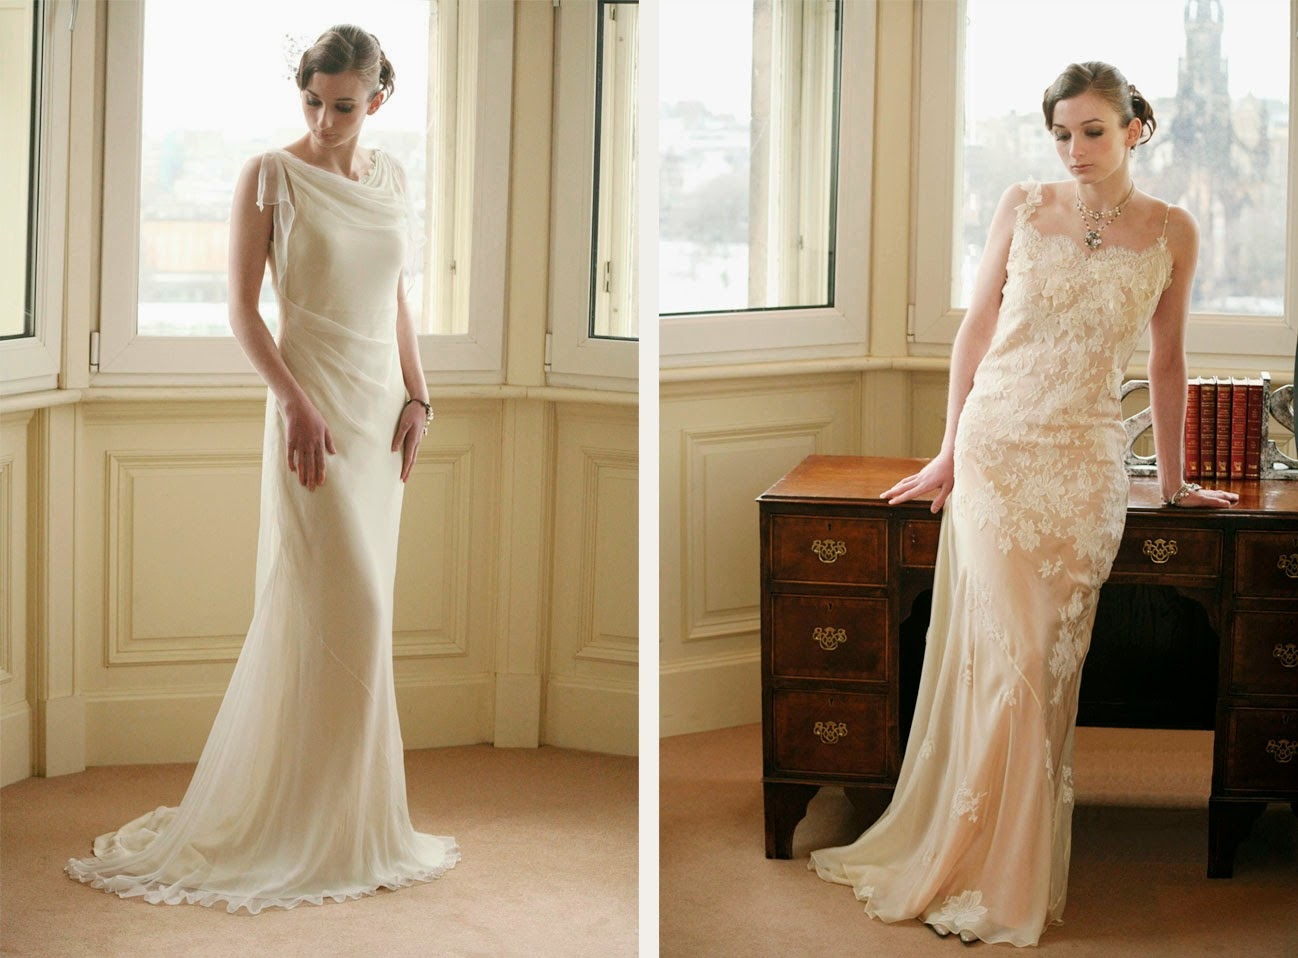 Vintage Wedding Dresses Cheap: 9 Ways Of Getting Cheap Wedding Dresses